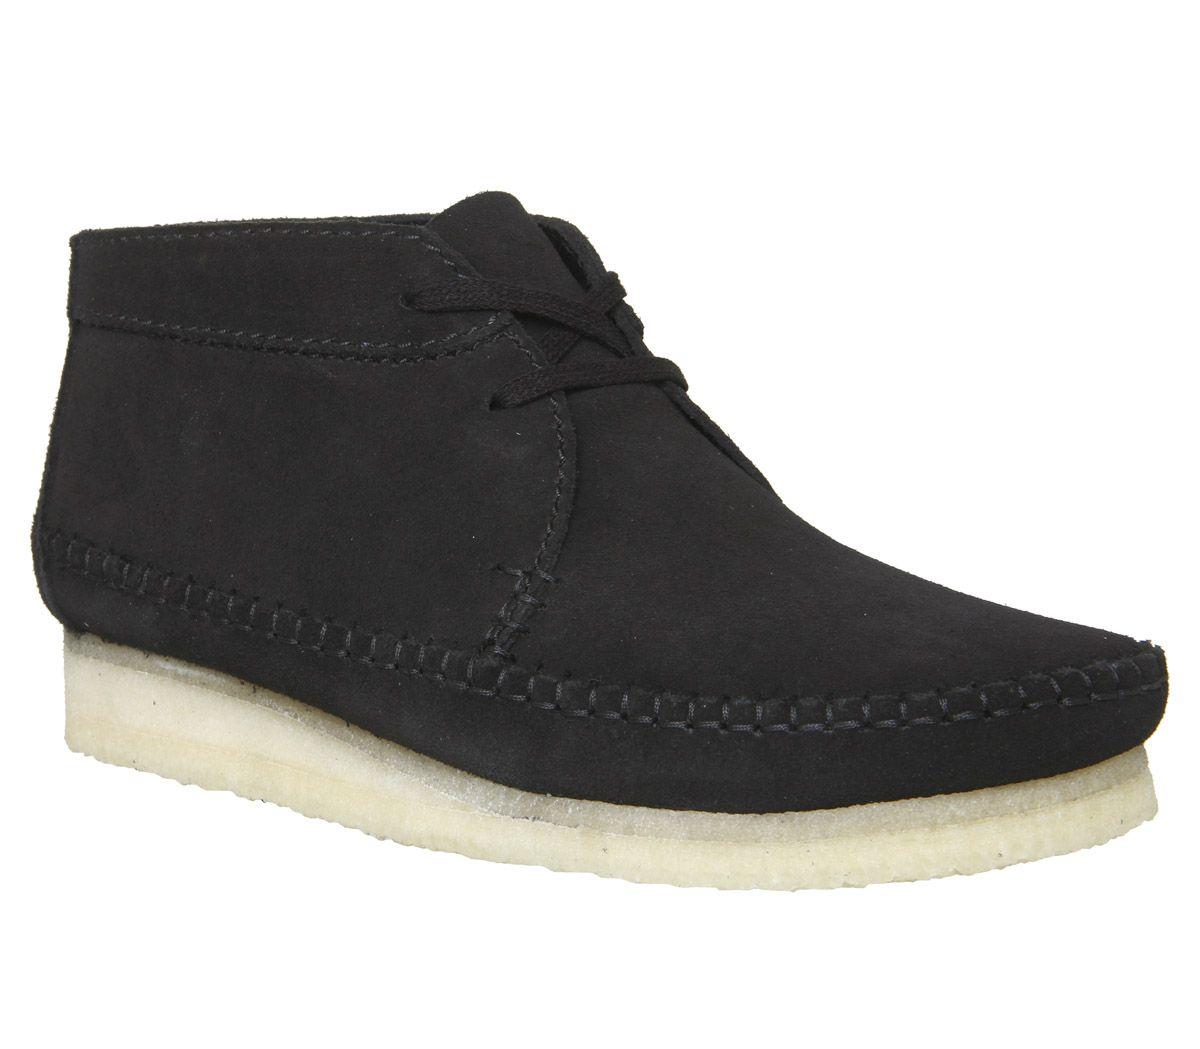 6d339f586e4 Clarks Originals Weaver Boots Black Suede New - Boots